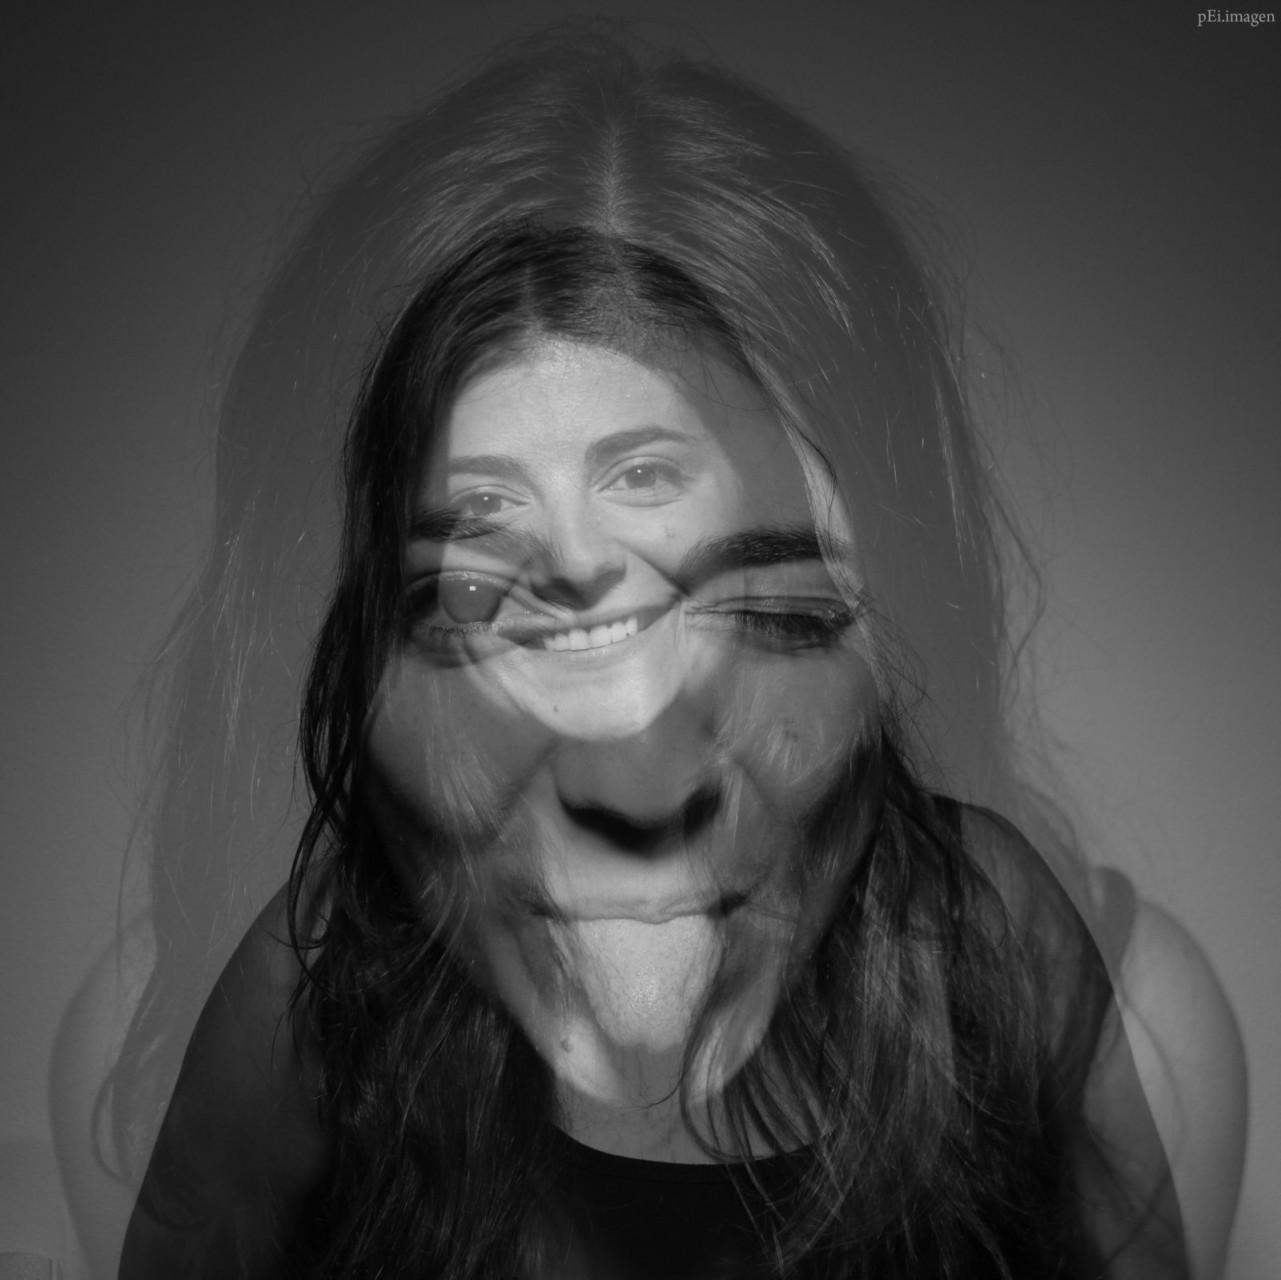 peipegata me myself I proyectos fotografia peipegatafotografia # 017 Elvira Rubio Barcena